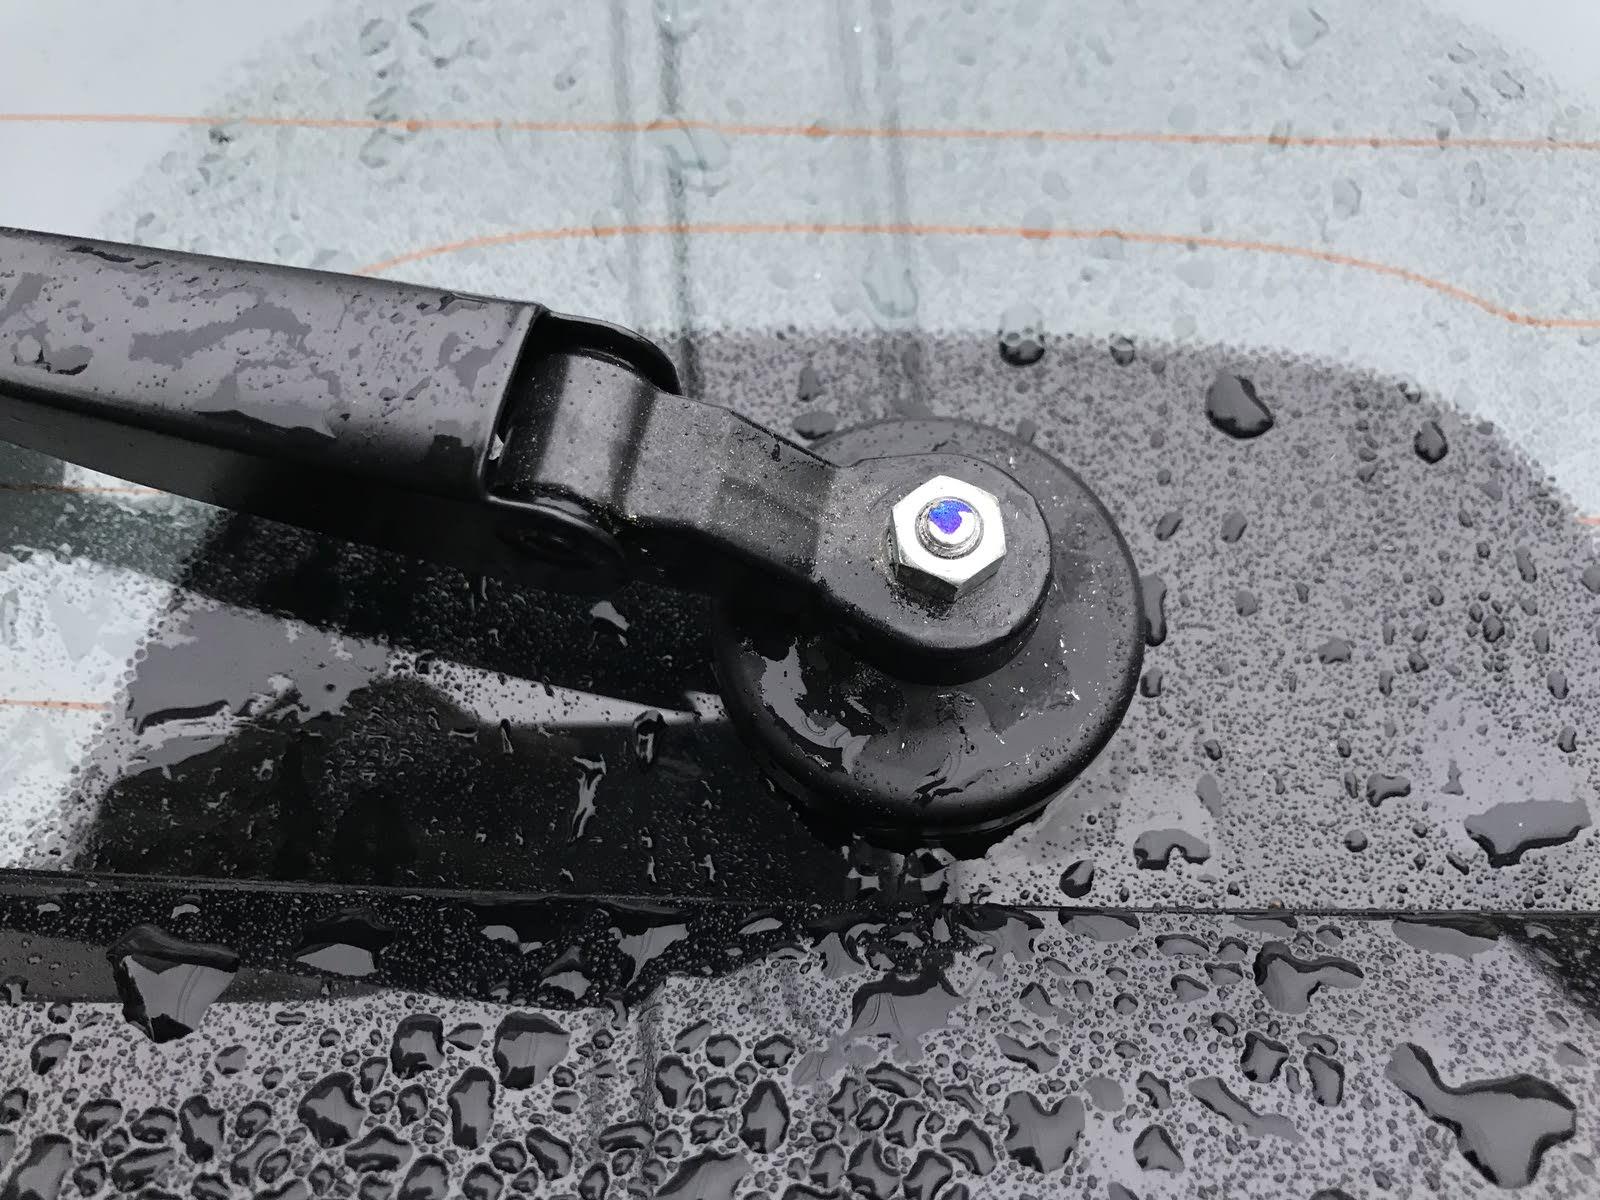 Honda Civic Questions Wiper Issue Happened Again My Wiper Motor Is Working I Hear The Mot Cargurus